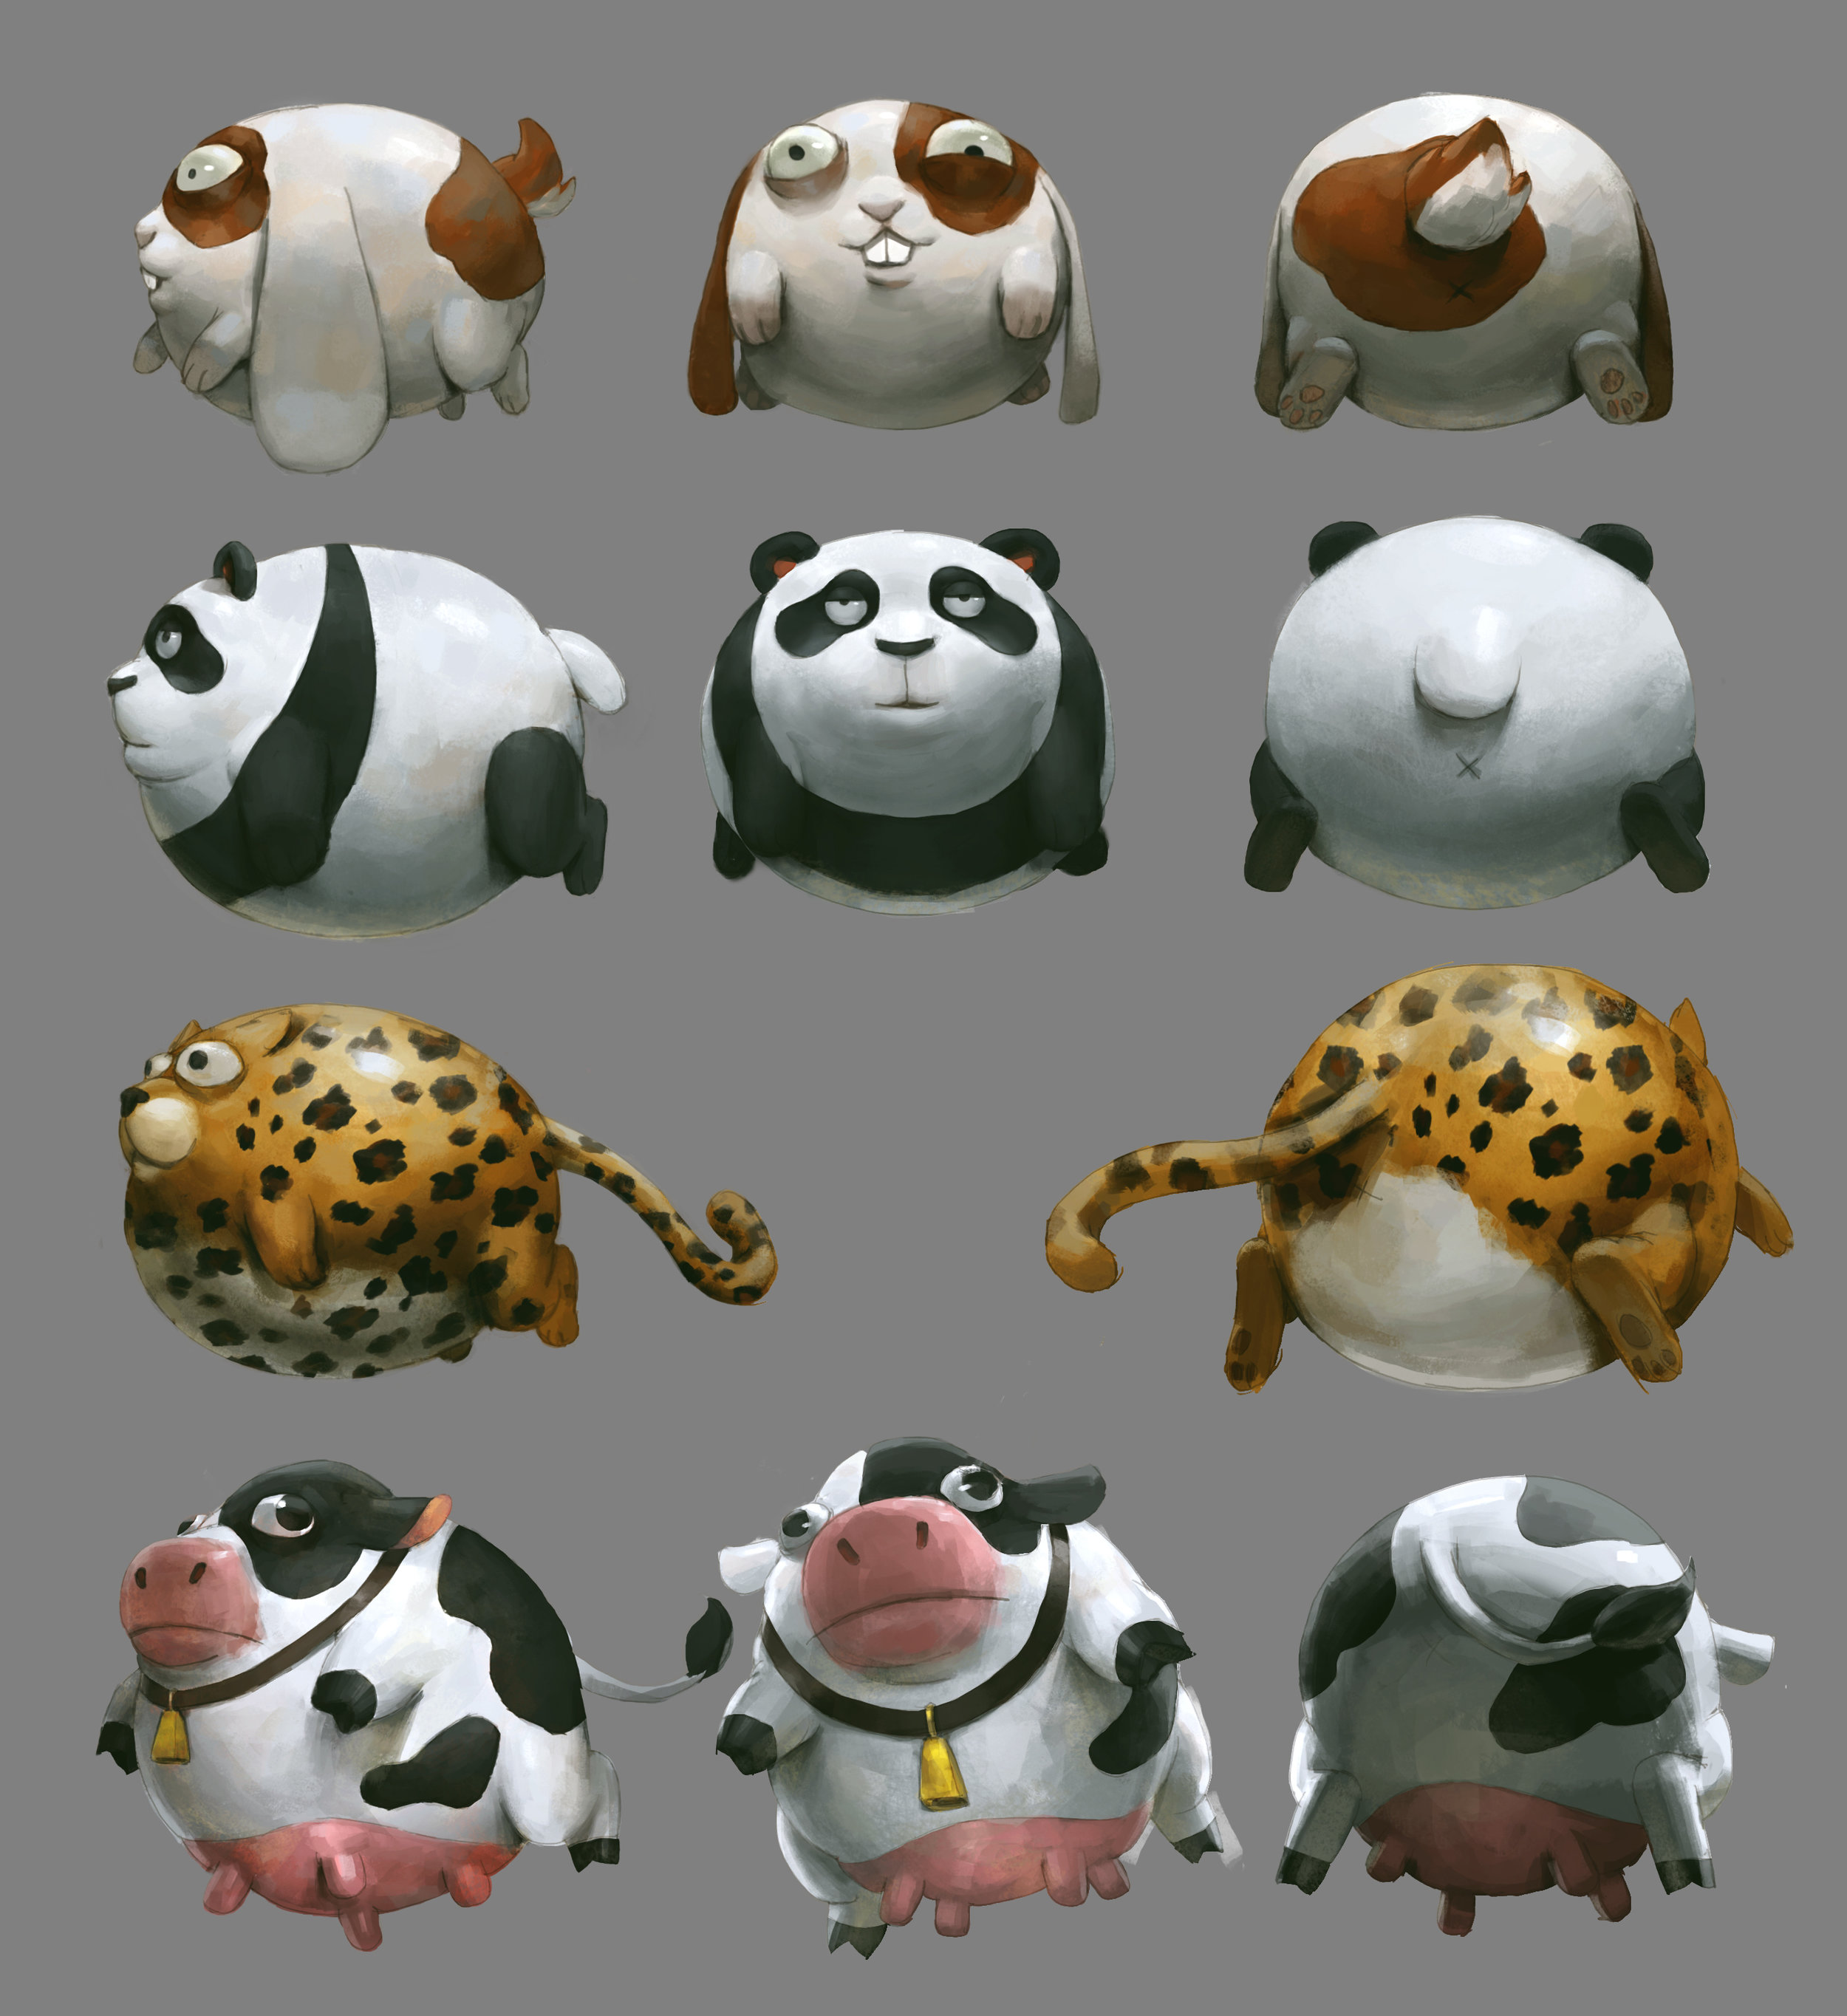 fat_animals_09a.jpg